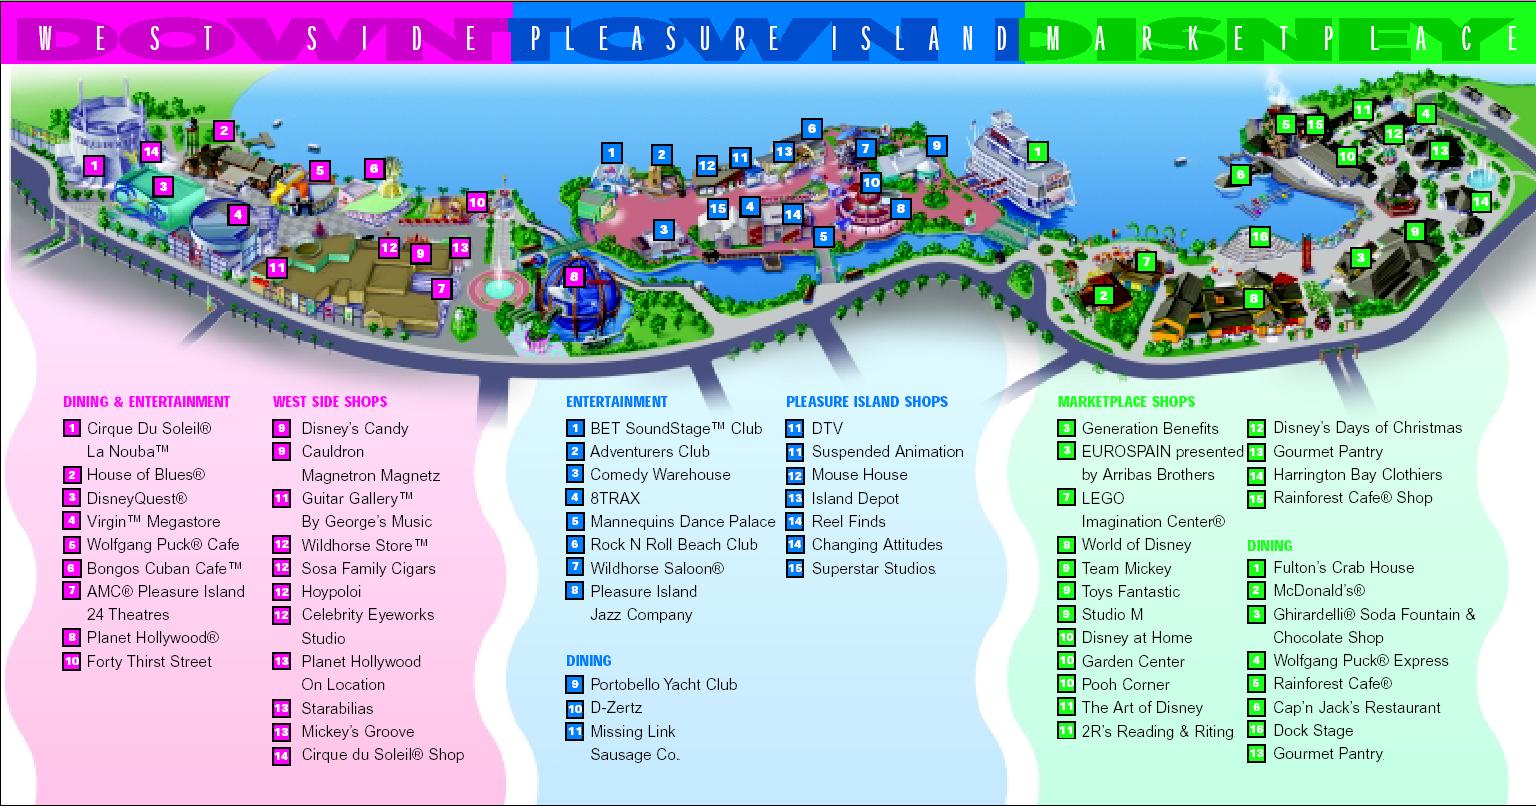 Map Of Pleasure Island Downtown Disney